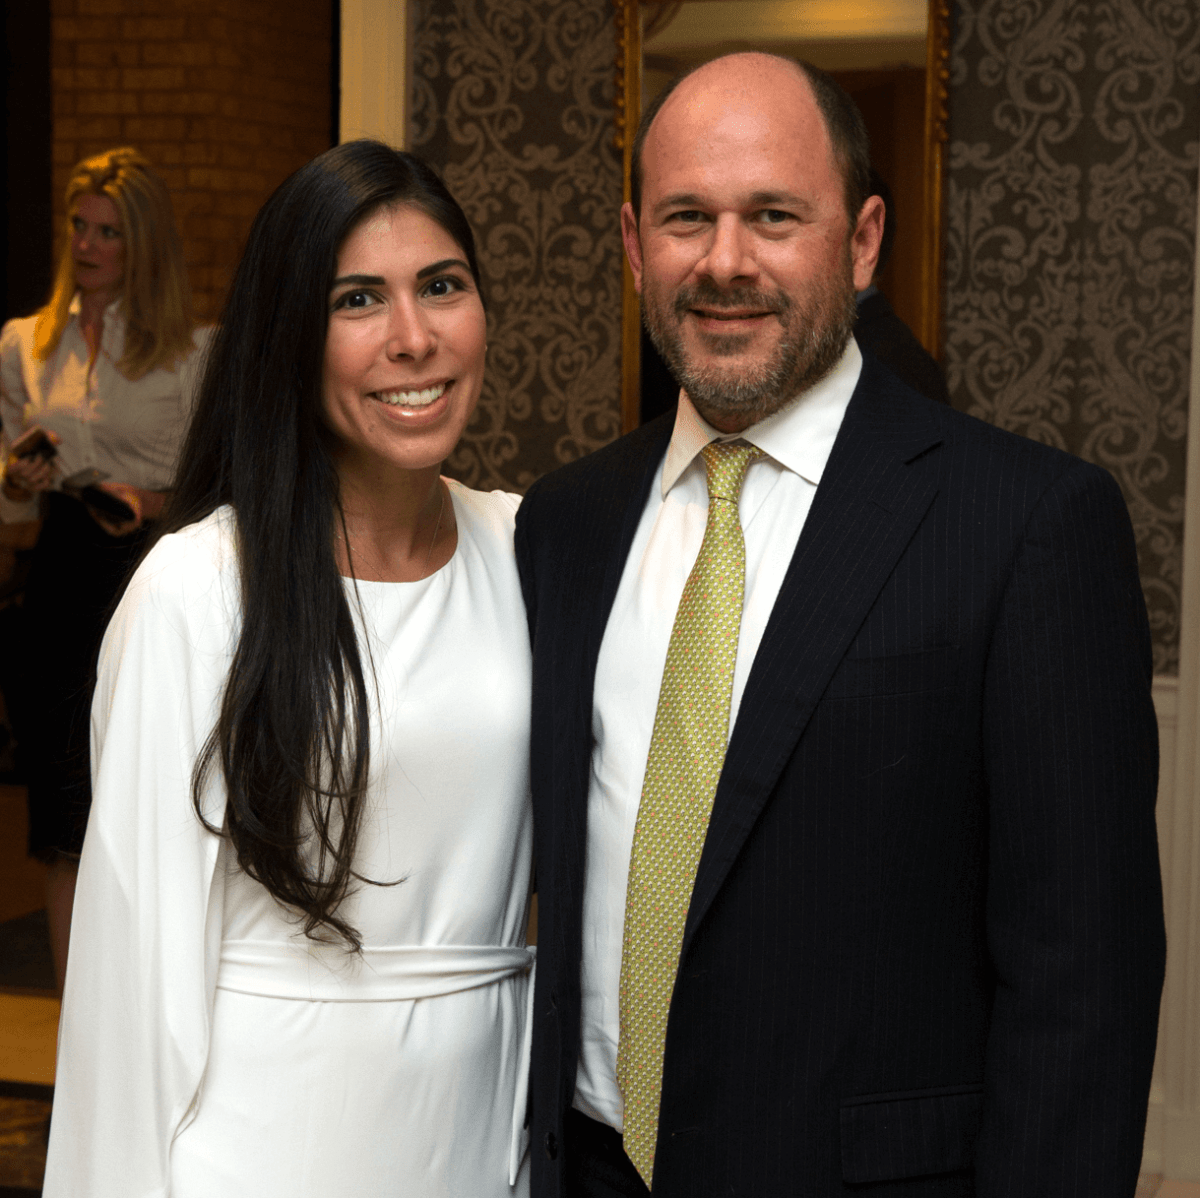 Houston, Legal Community's Harvest Celebration, Nov 2016, Sarah Cabello, Todd Frankfort